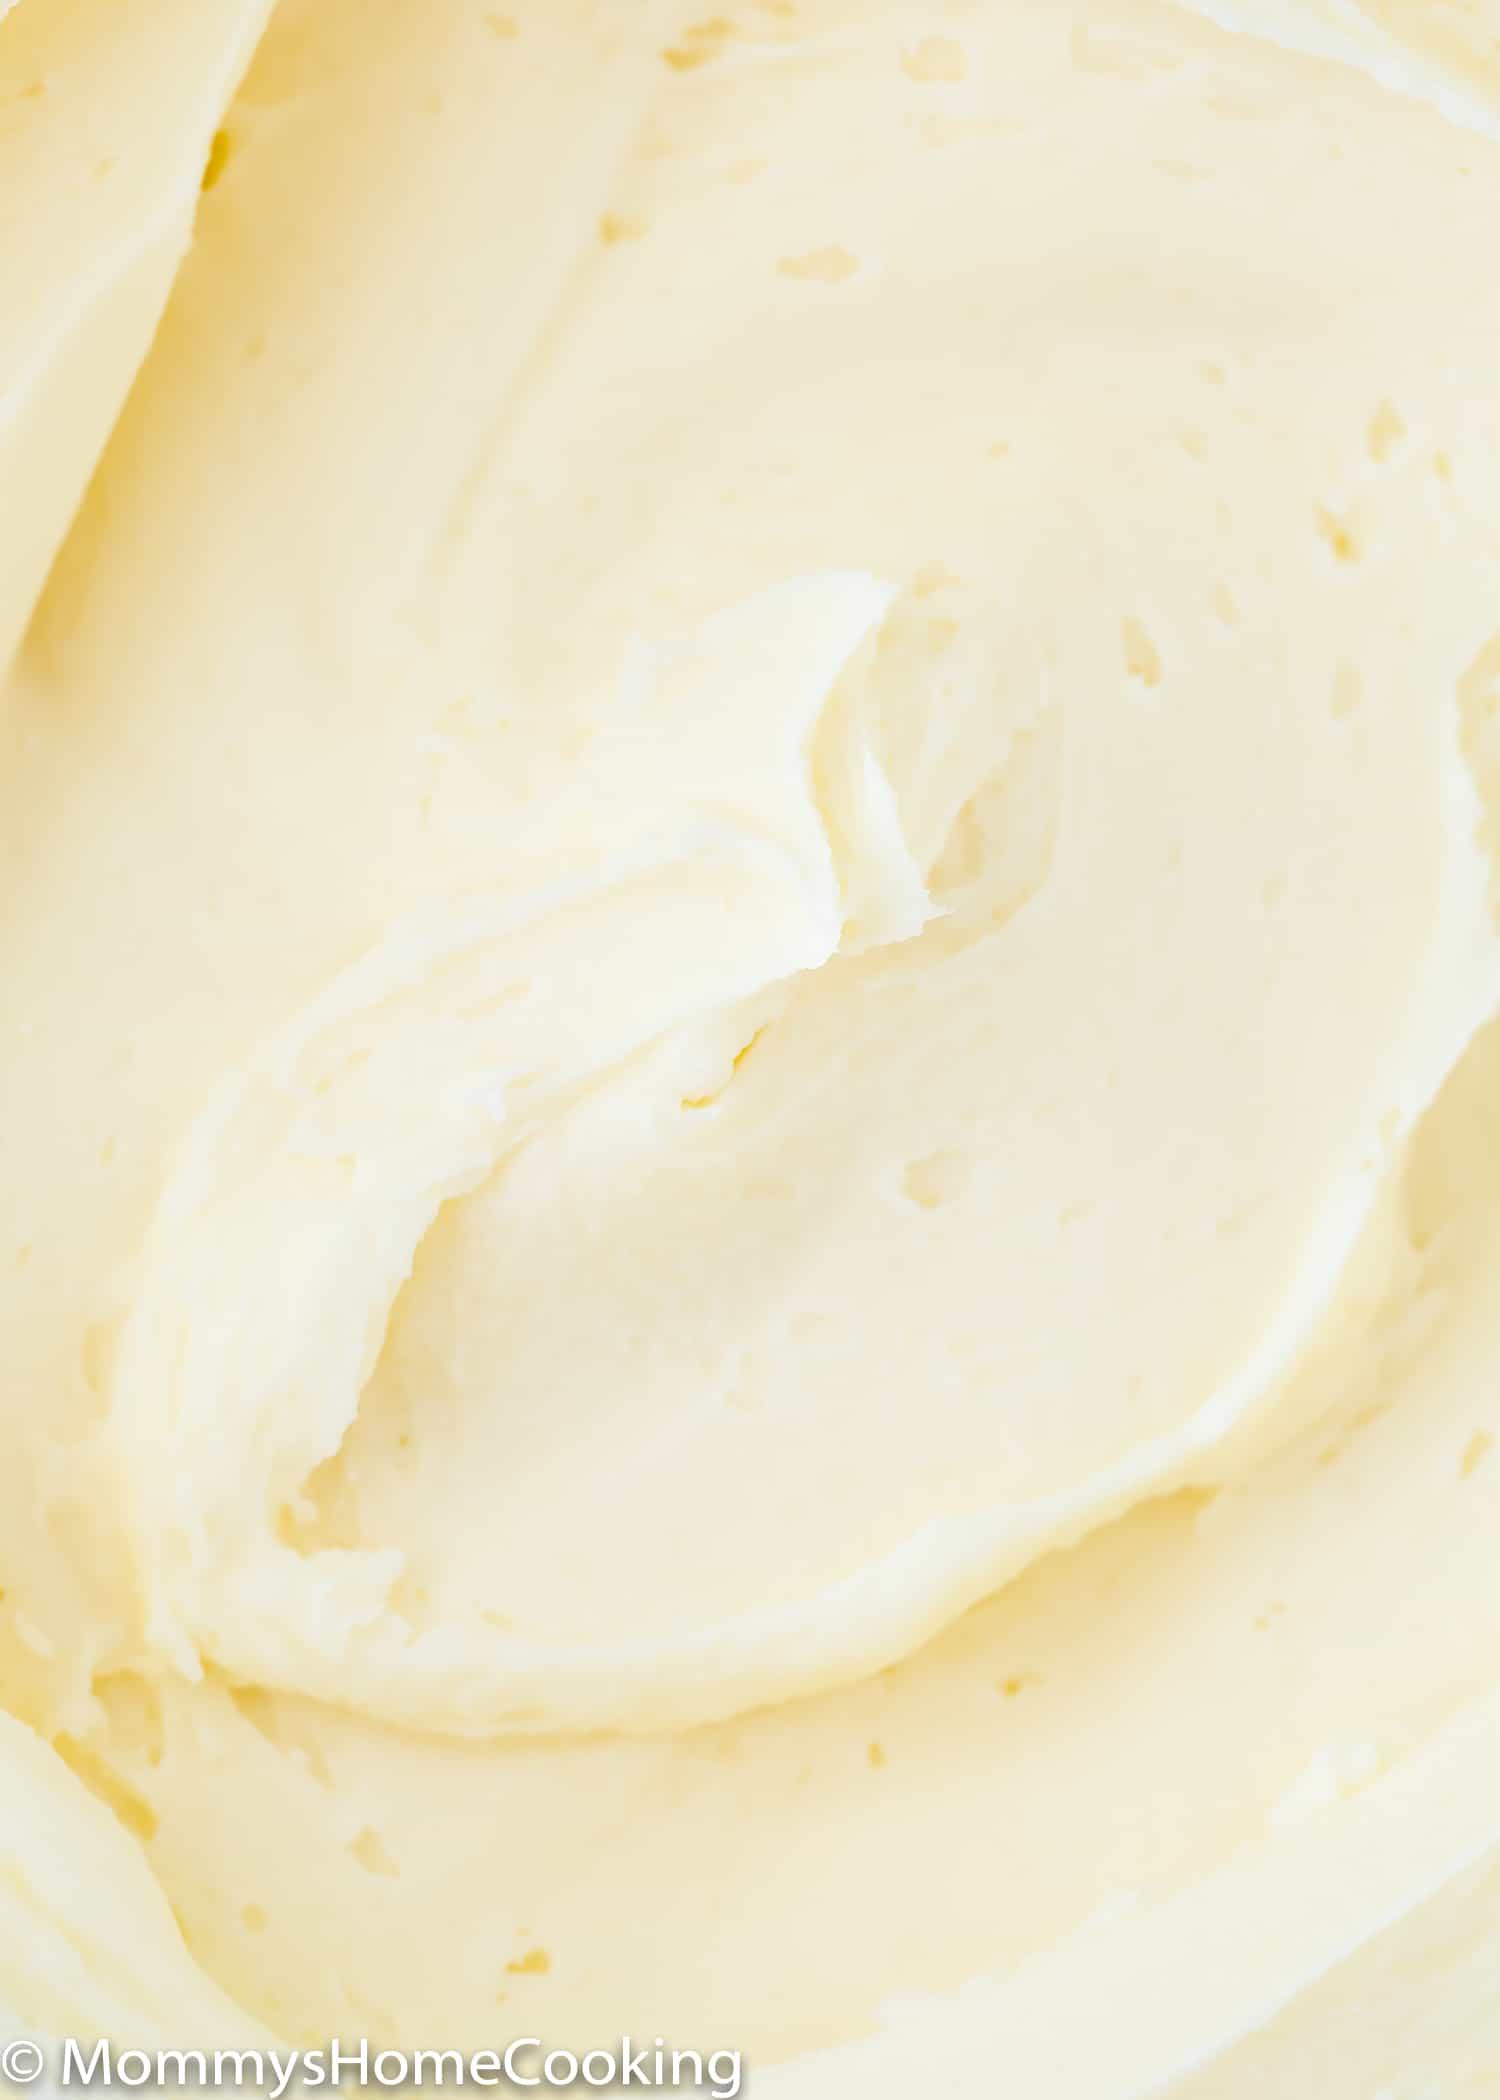 Vanilla buttercream frosting close-up